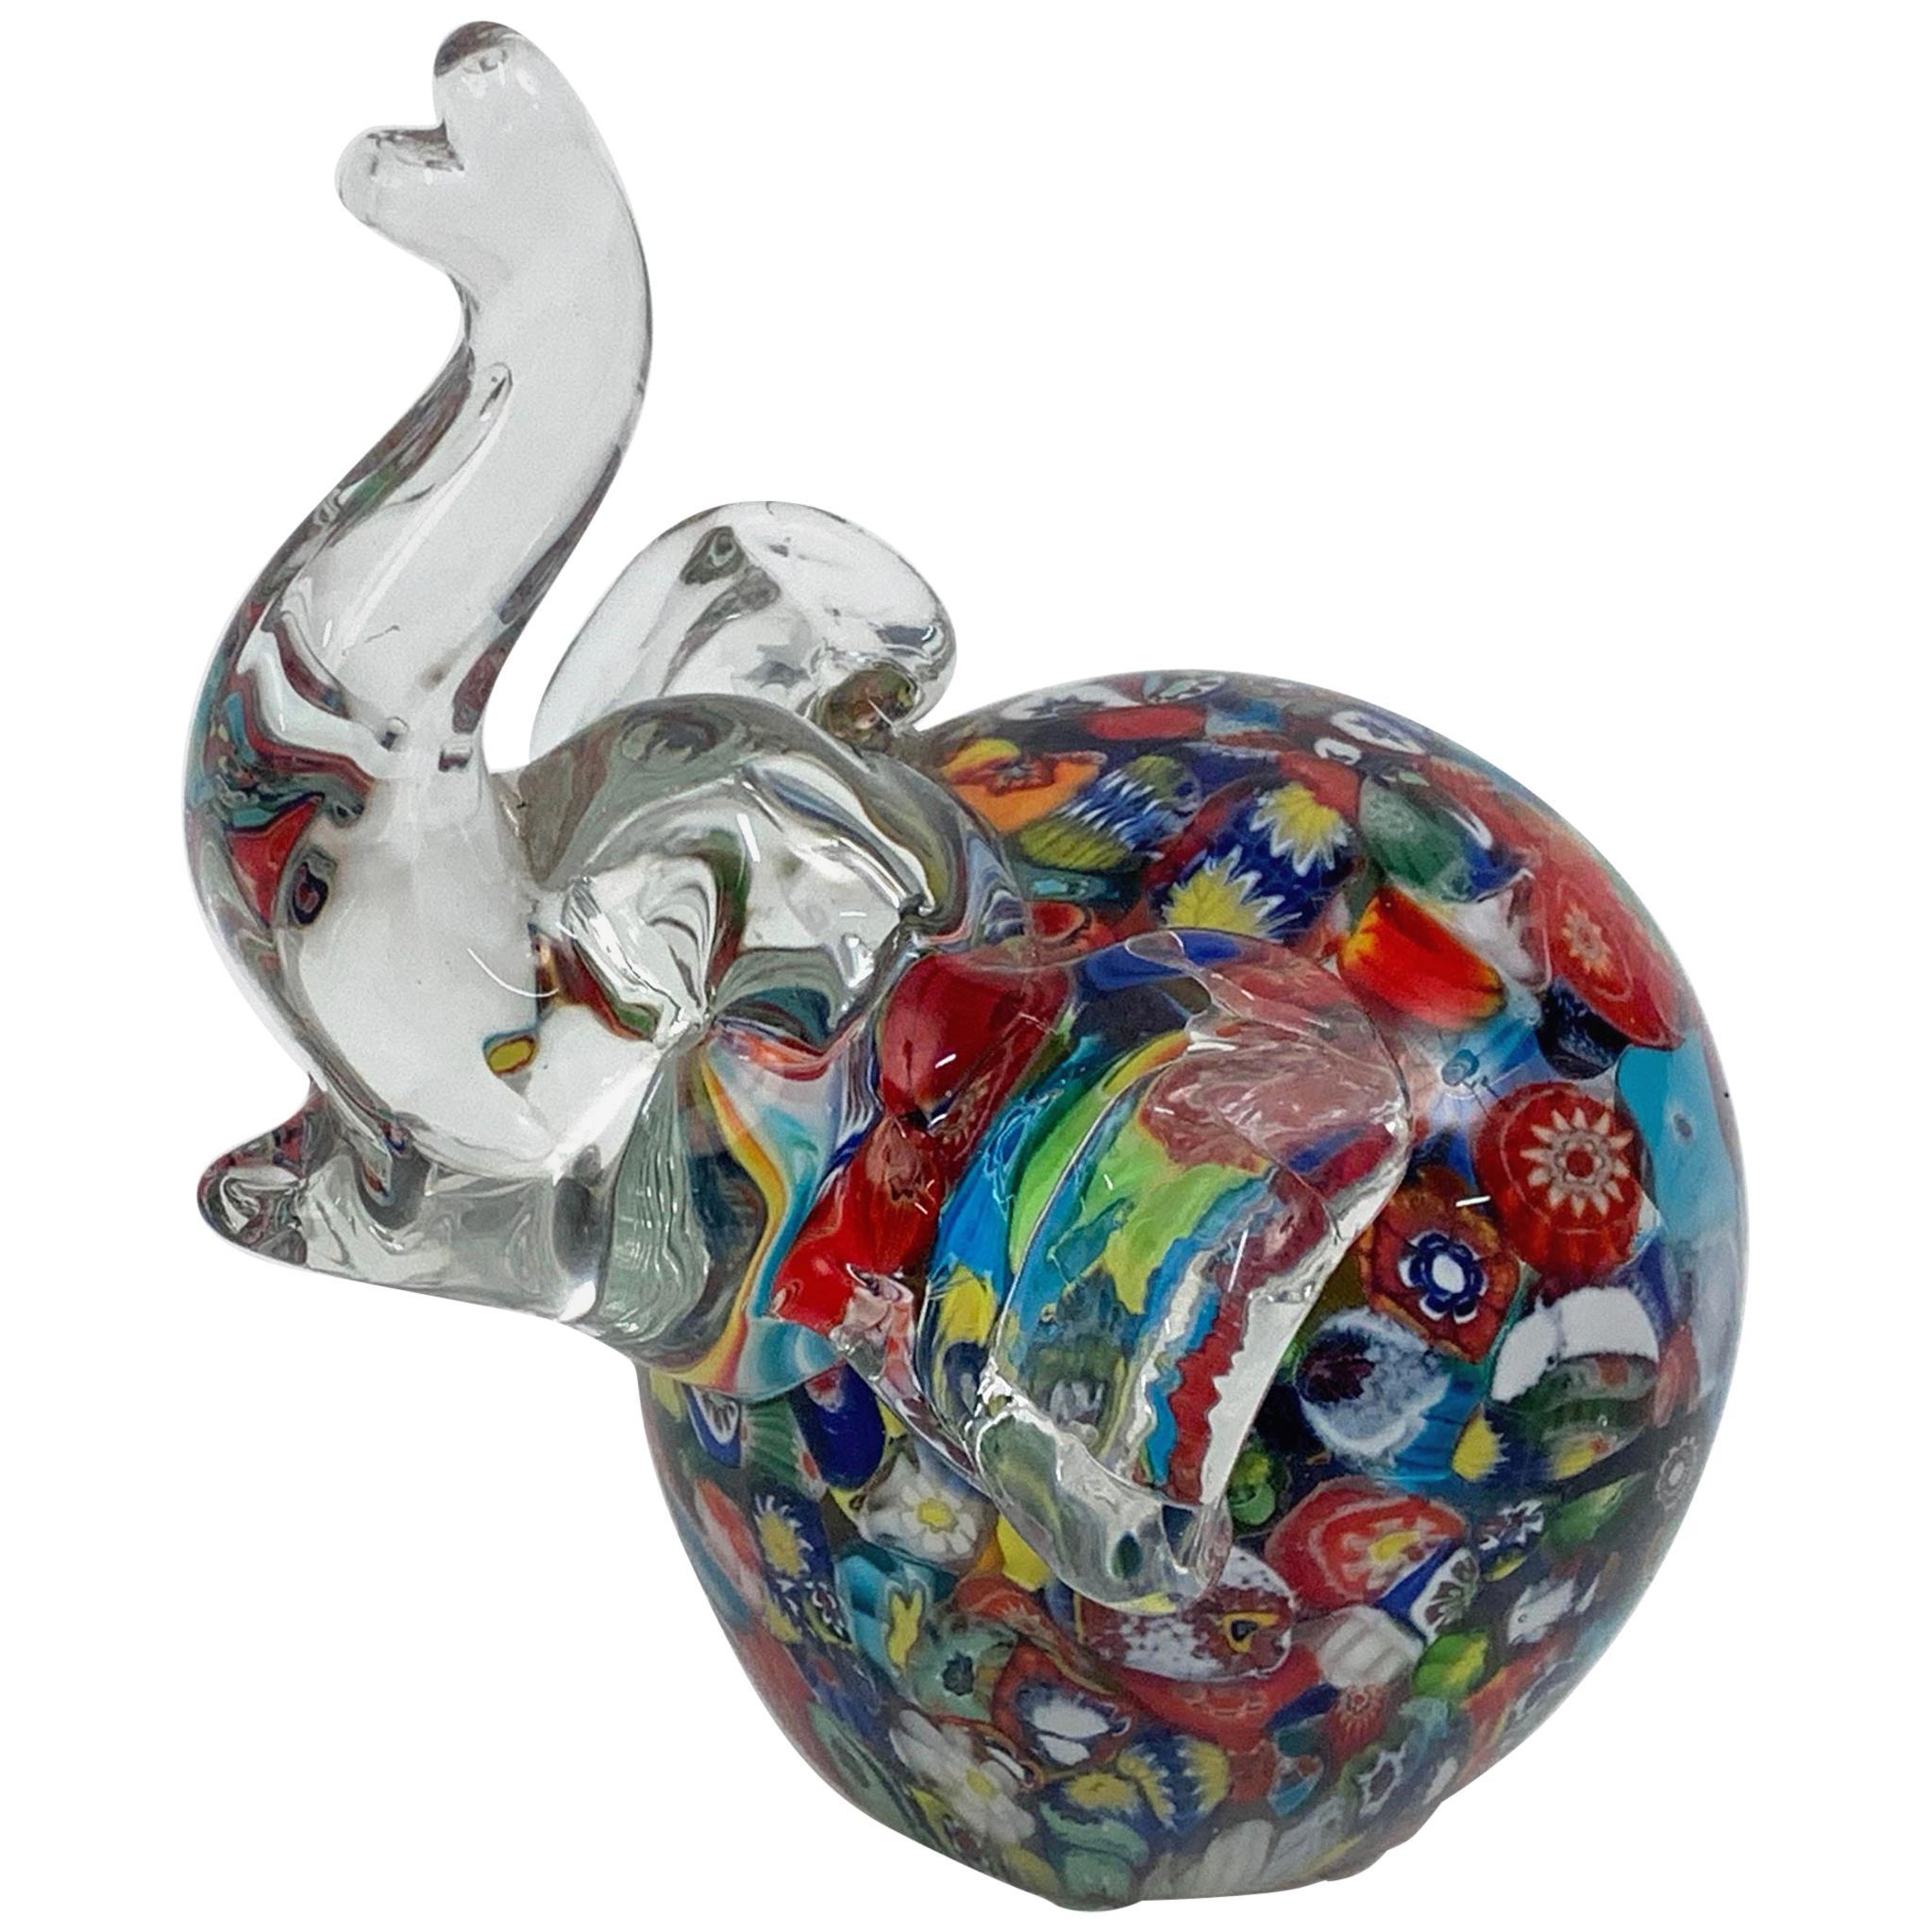 Toso Midcentury Murano Glass Millefiori Elephant Italian Sculpture, 1970s